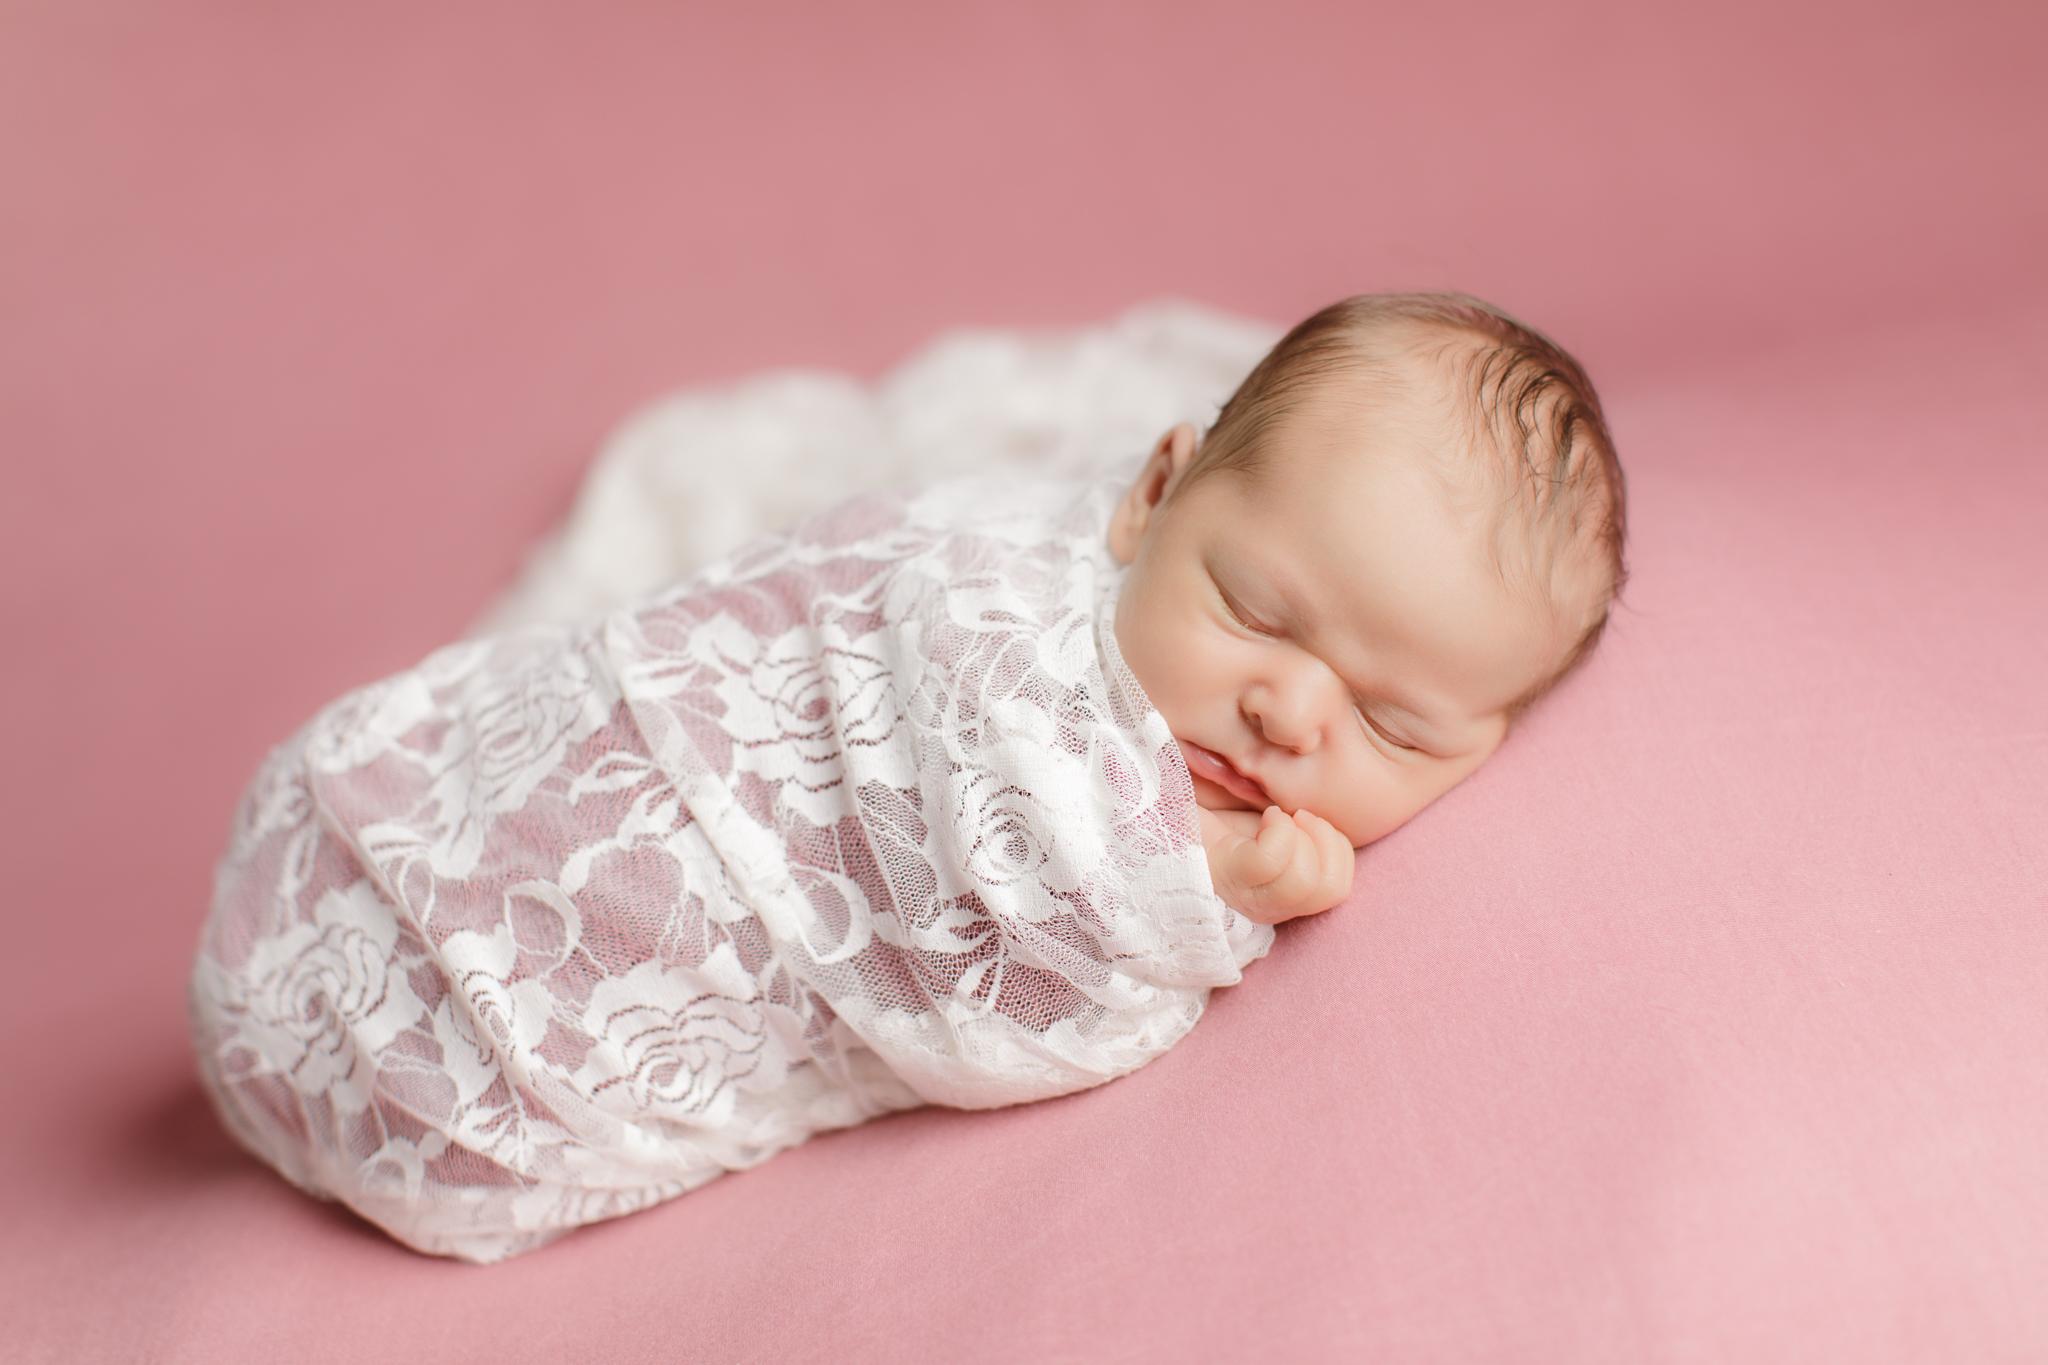 Newborn portrait on pink backdrop in Wakefield, RI